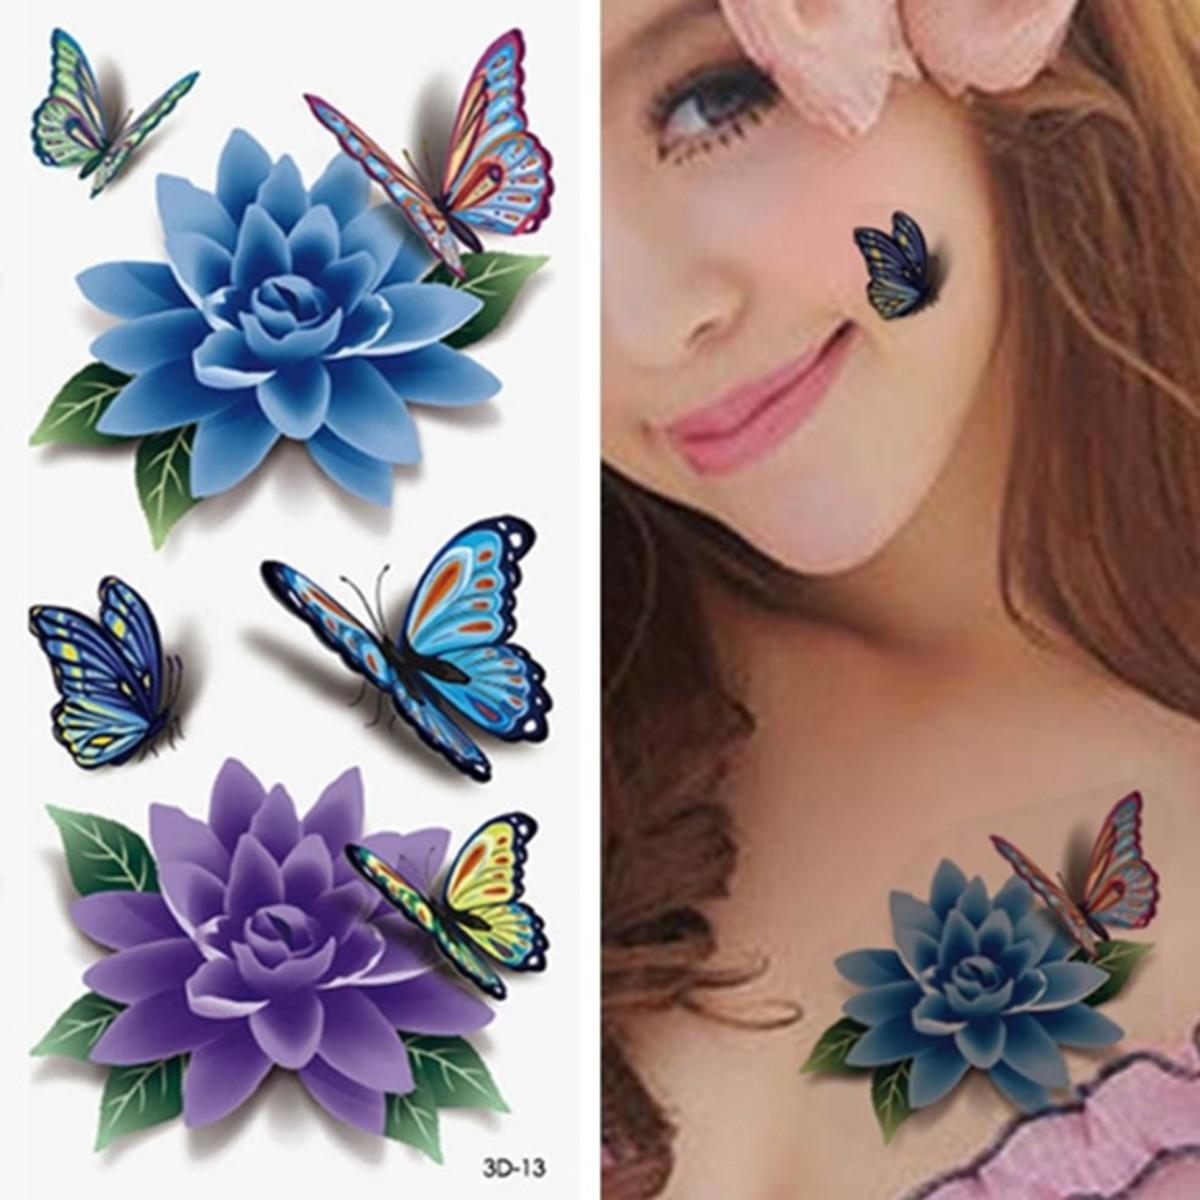 Tatuagem Temporária Adesiva 3d Flor De Lotus Kit 3cartelas